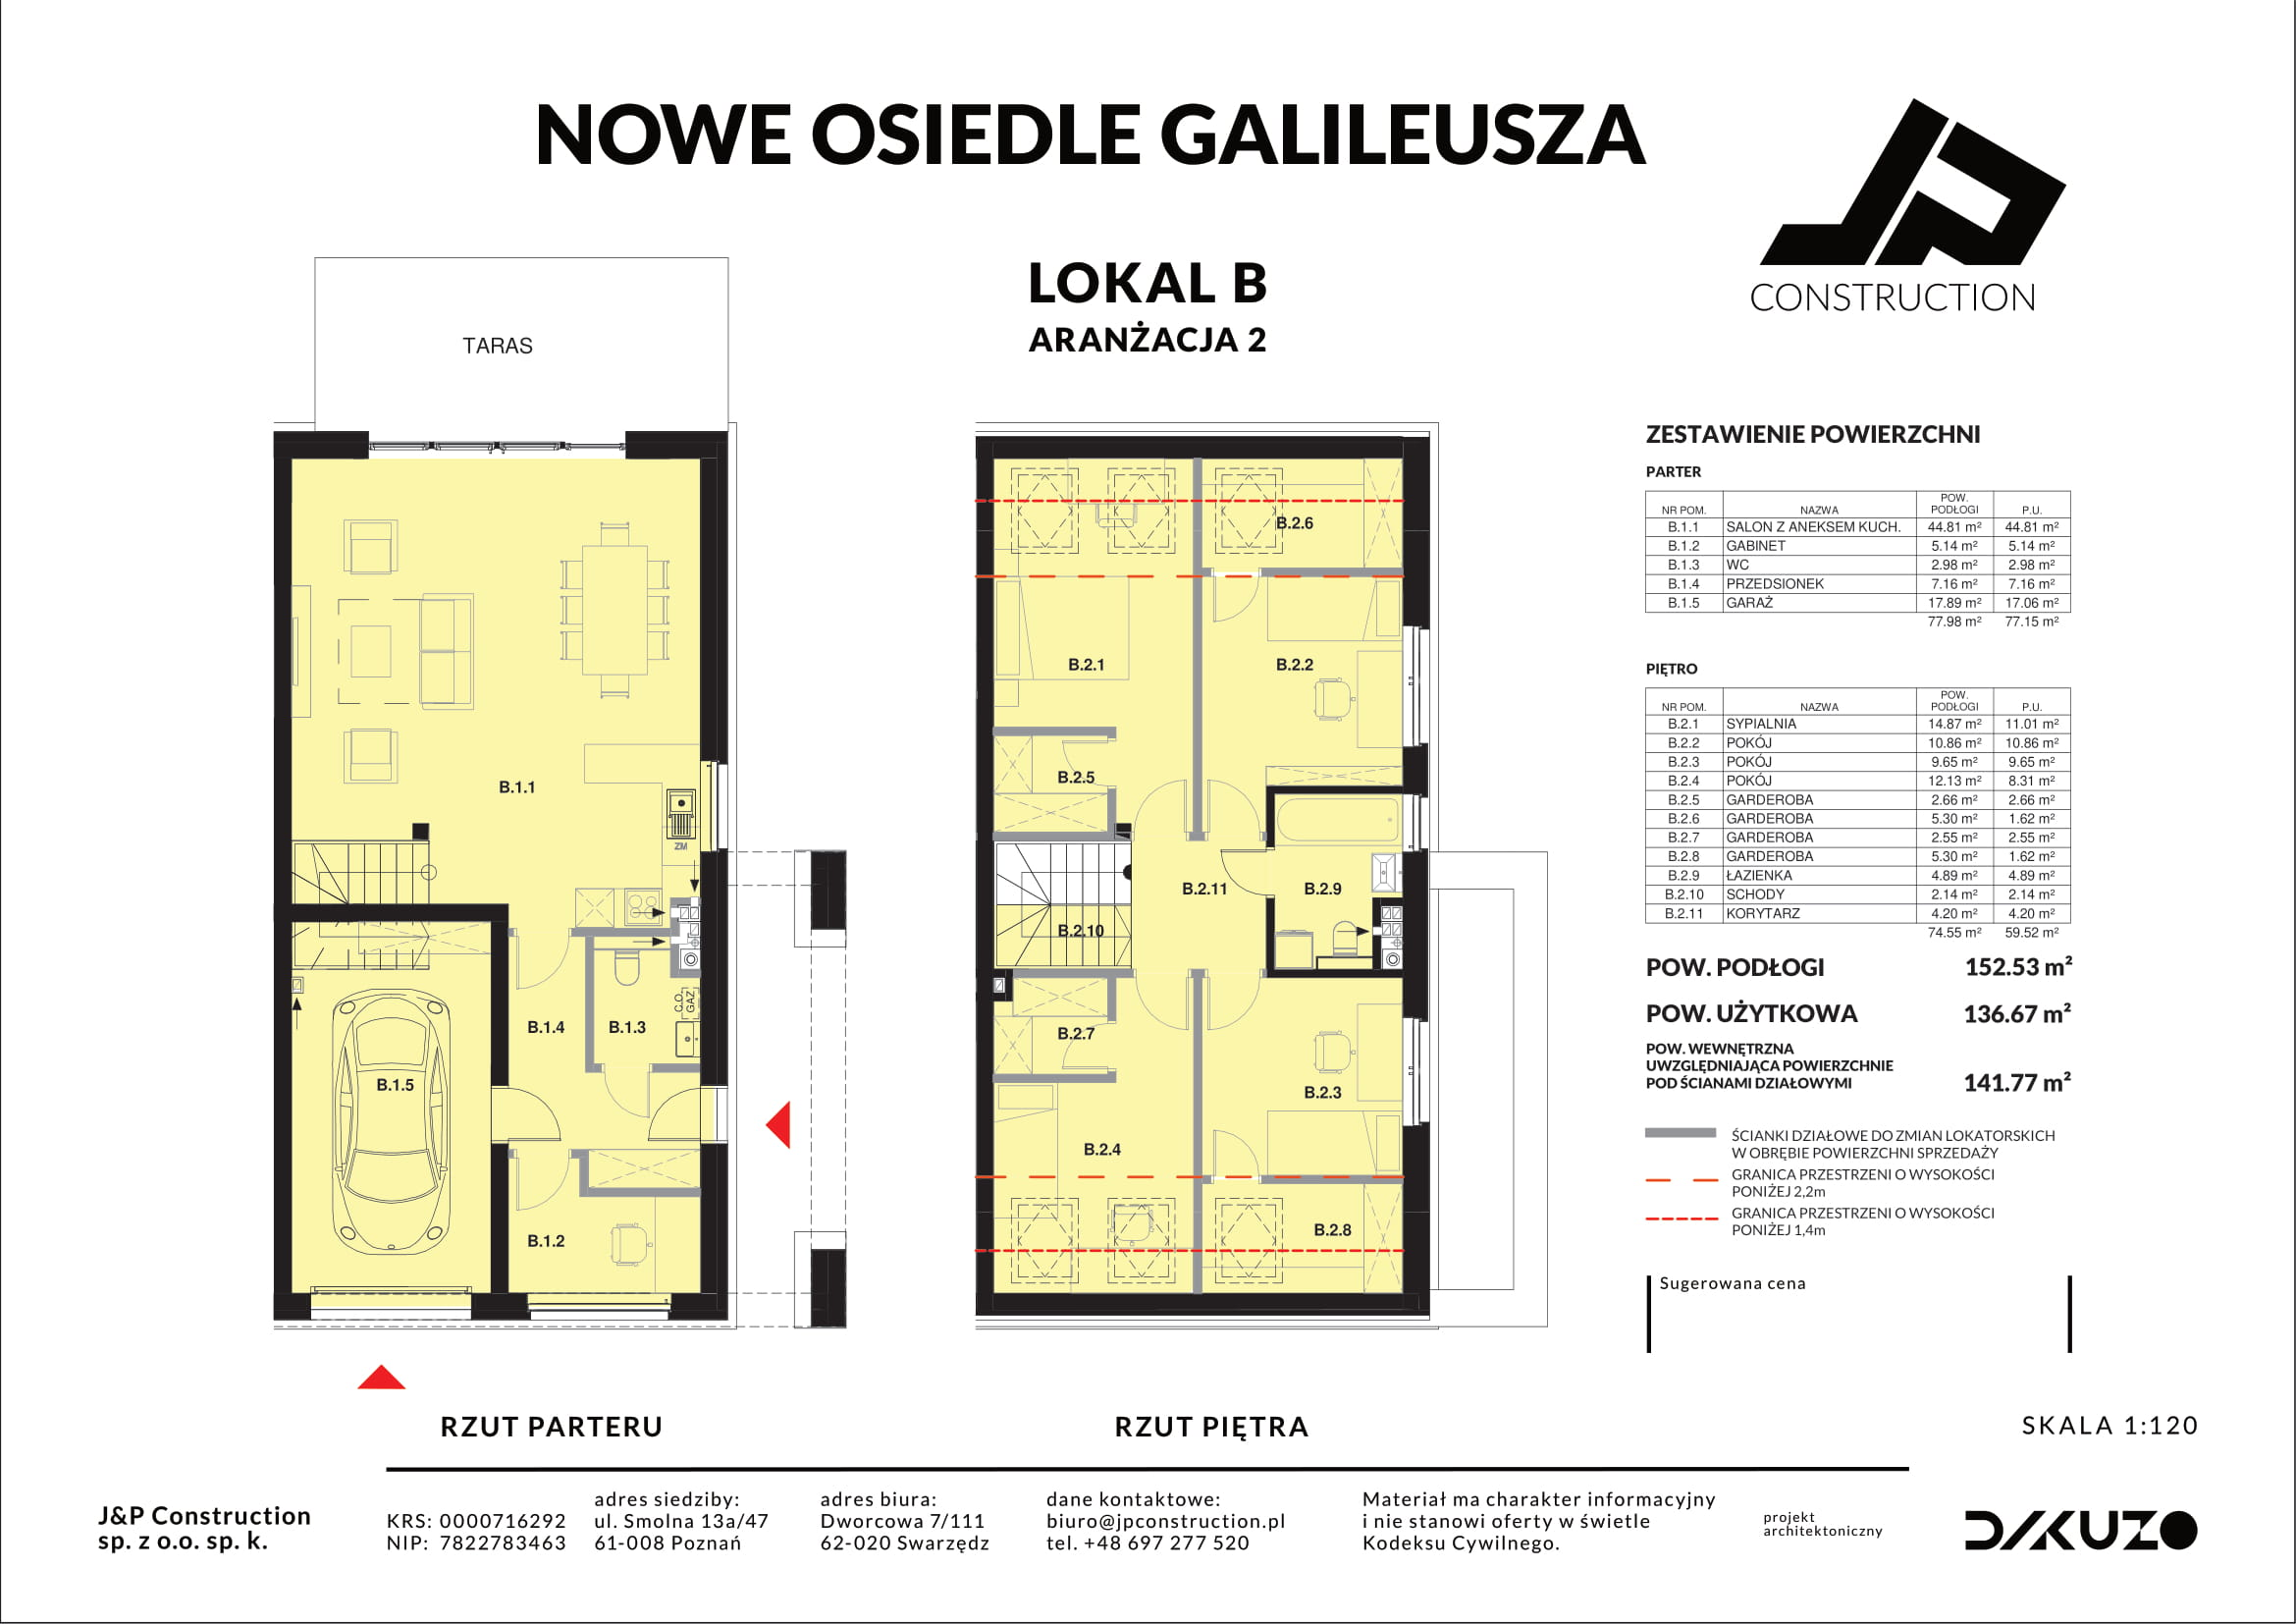 ZALASEWO-GAL-KARTA-LOKAL-B-aranzacja-2-1